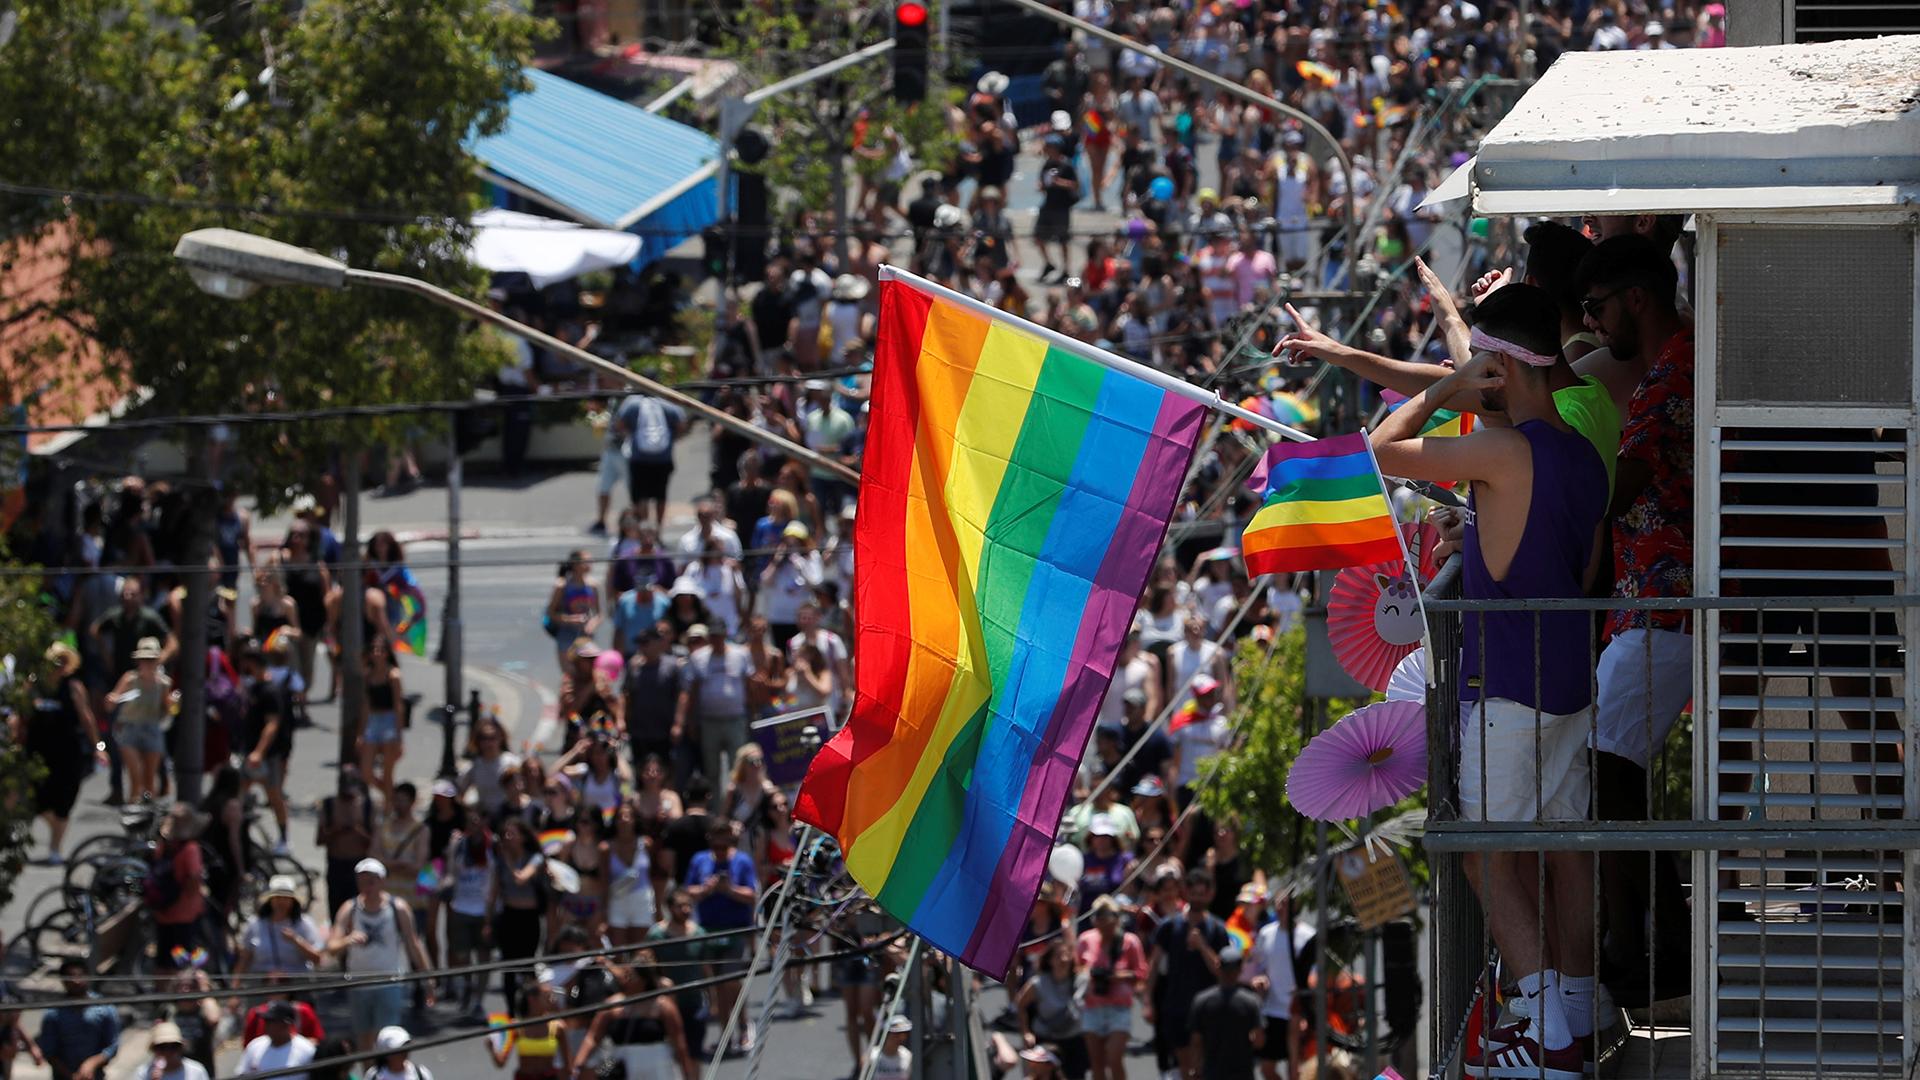 Foto aérea de la gran convocatoria por la marcha del Orgullo Gay en Tel Aviv.